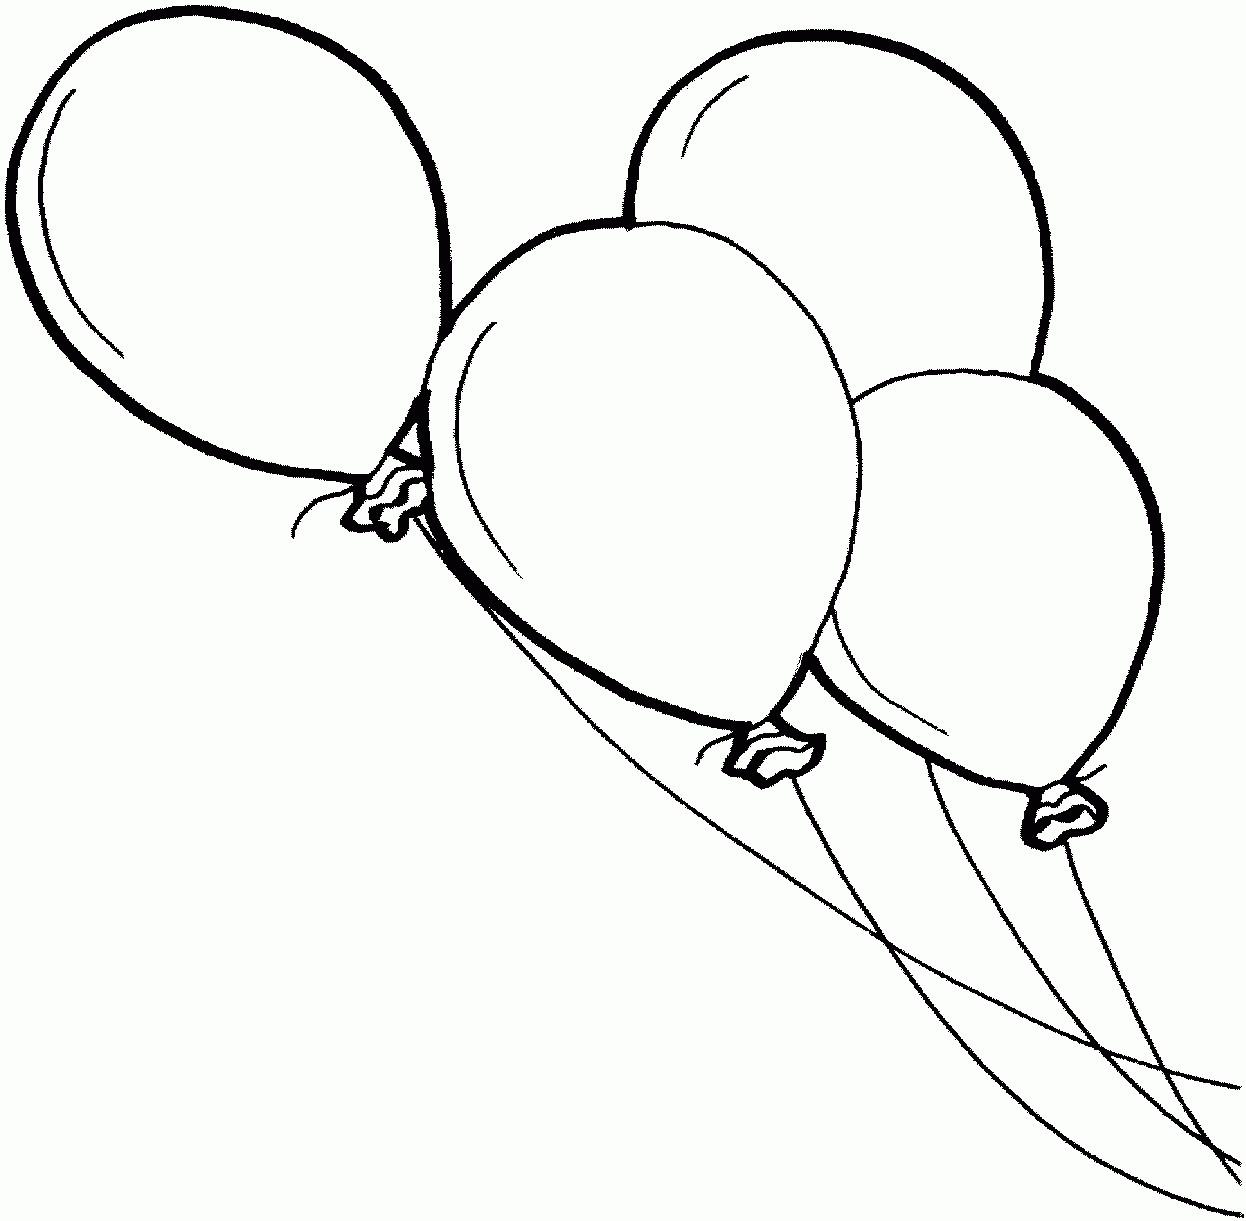 beste 20 ausmalbilder luftballons  beste wohnkultur